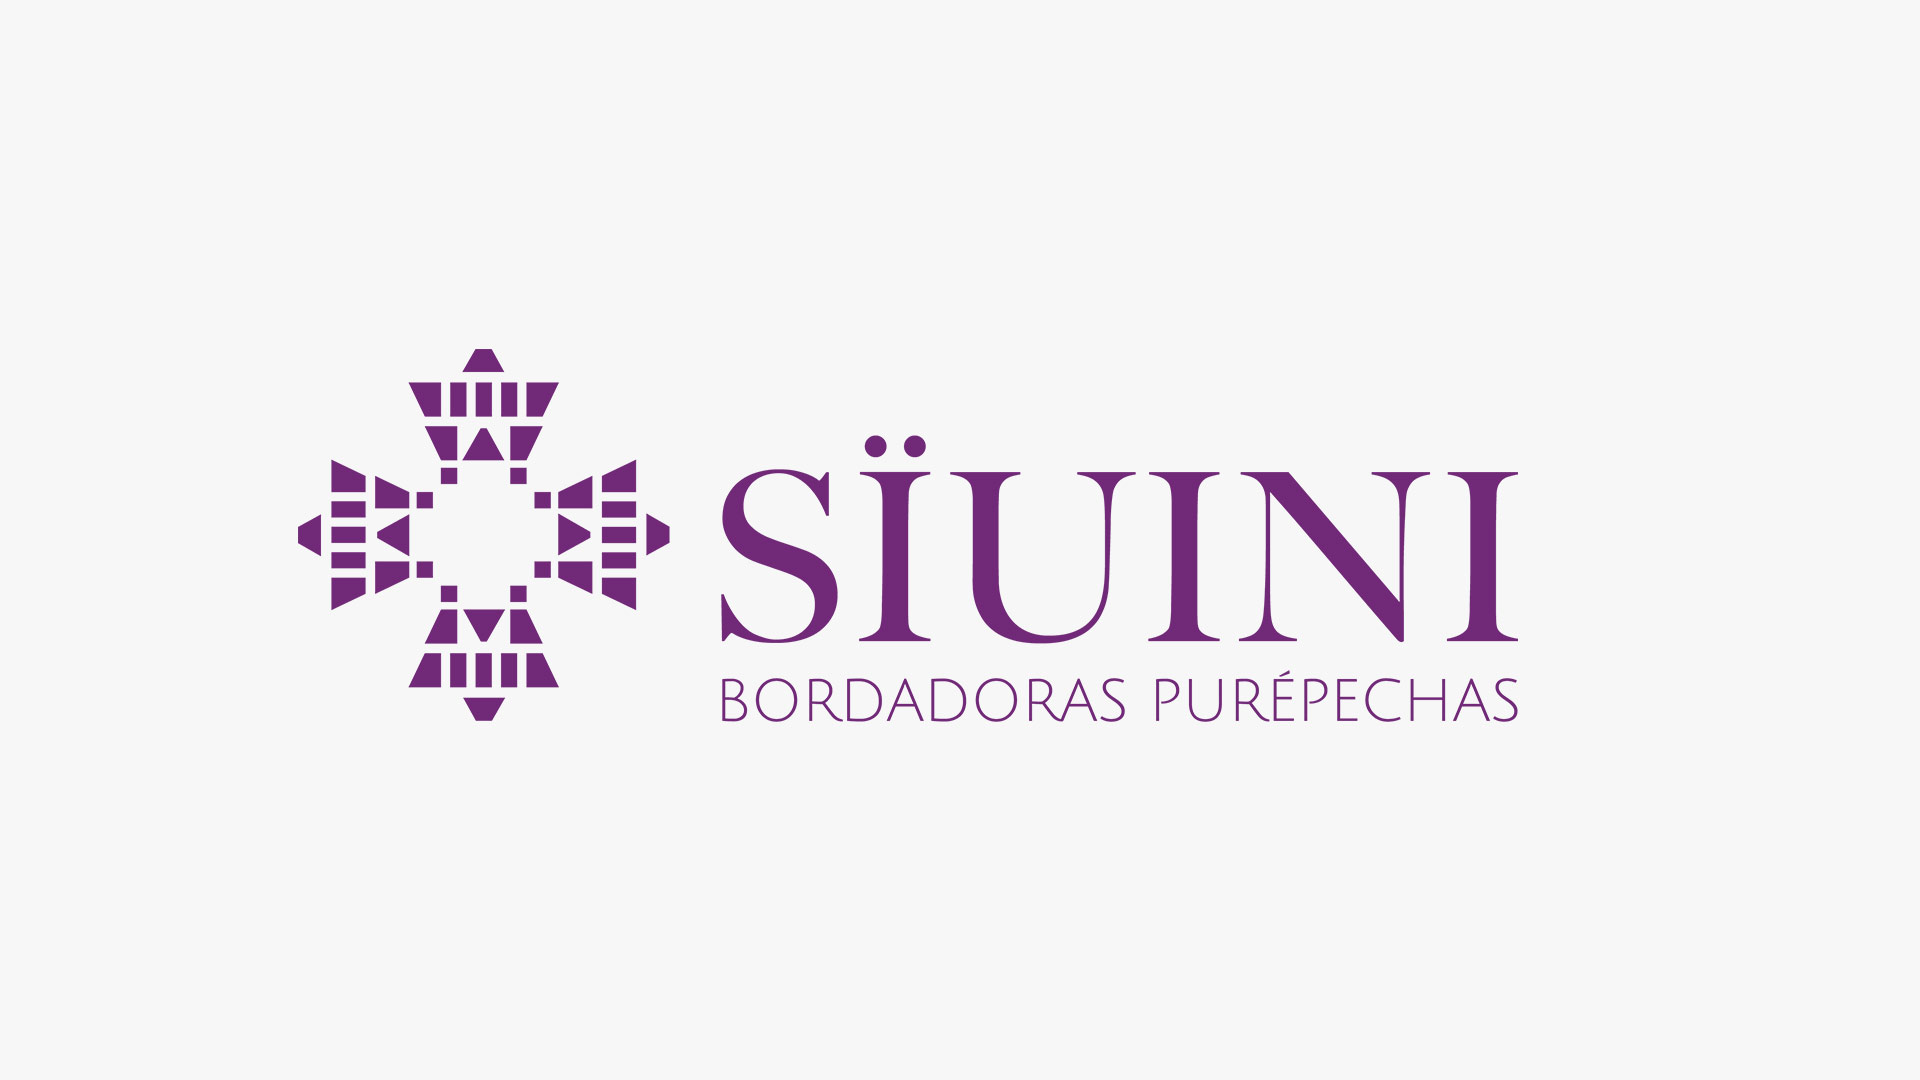 diseno-grafico-logotipo-branding-3-suini-universidad-iberoamericana-quinta-imagen